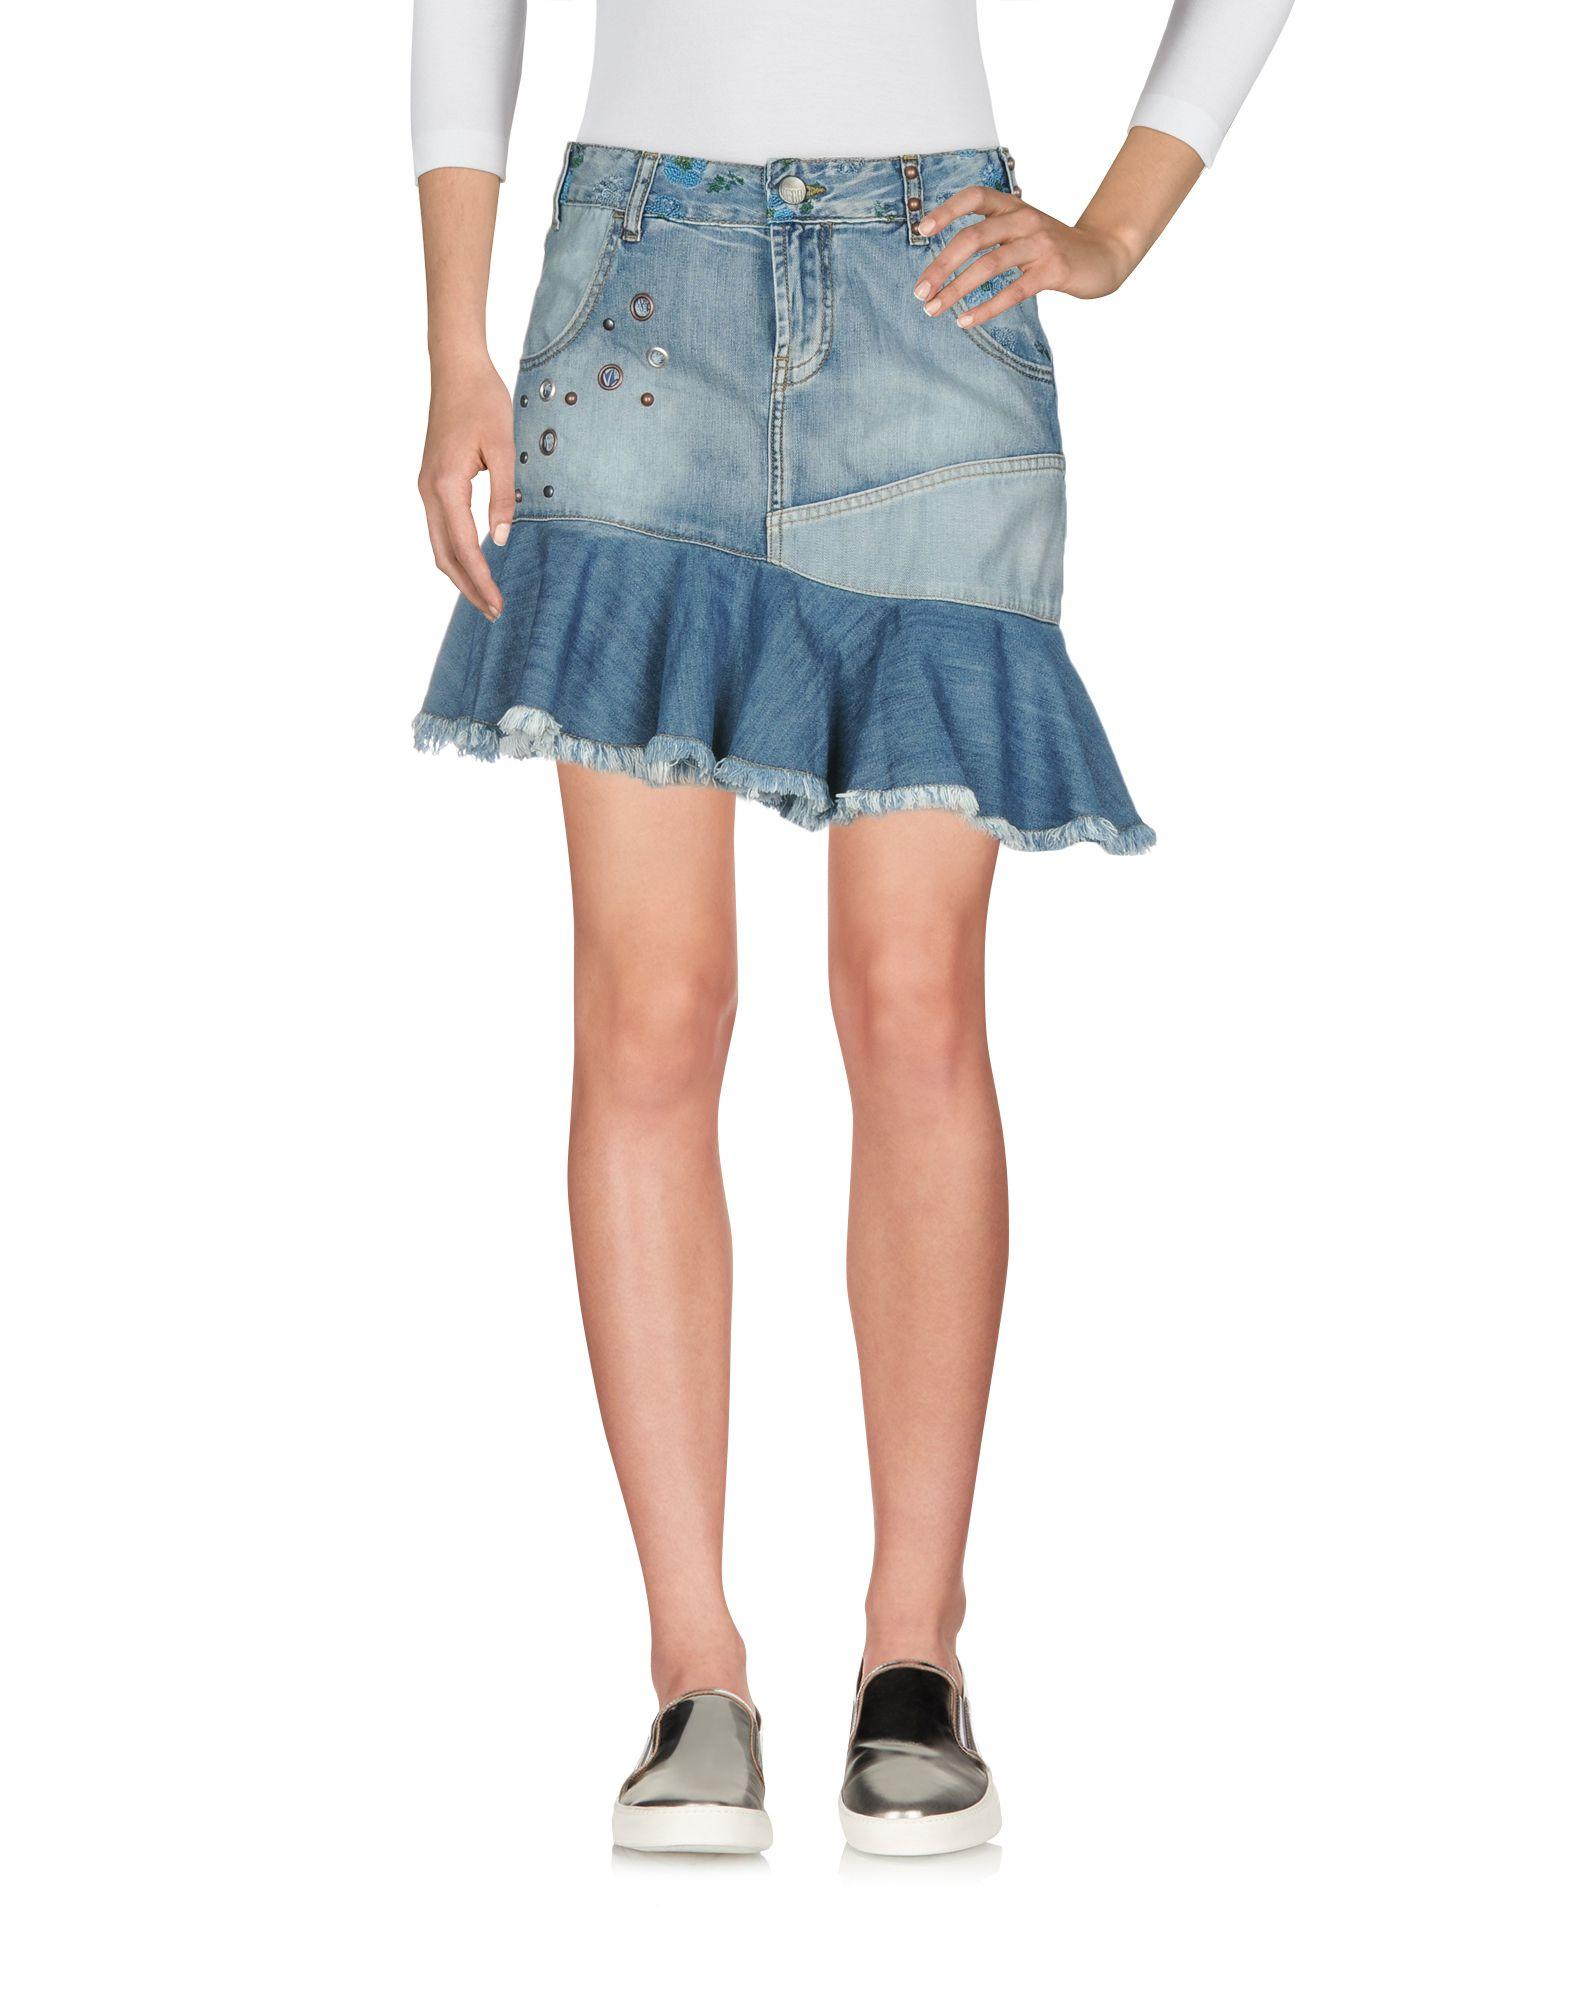 01c12090d Desigual Denim Skirt - Women Desigual Denim Skirts online on YOOX ...